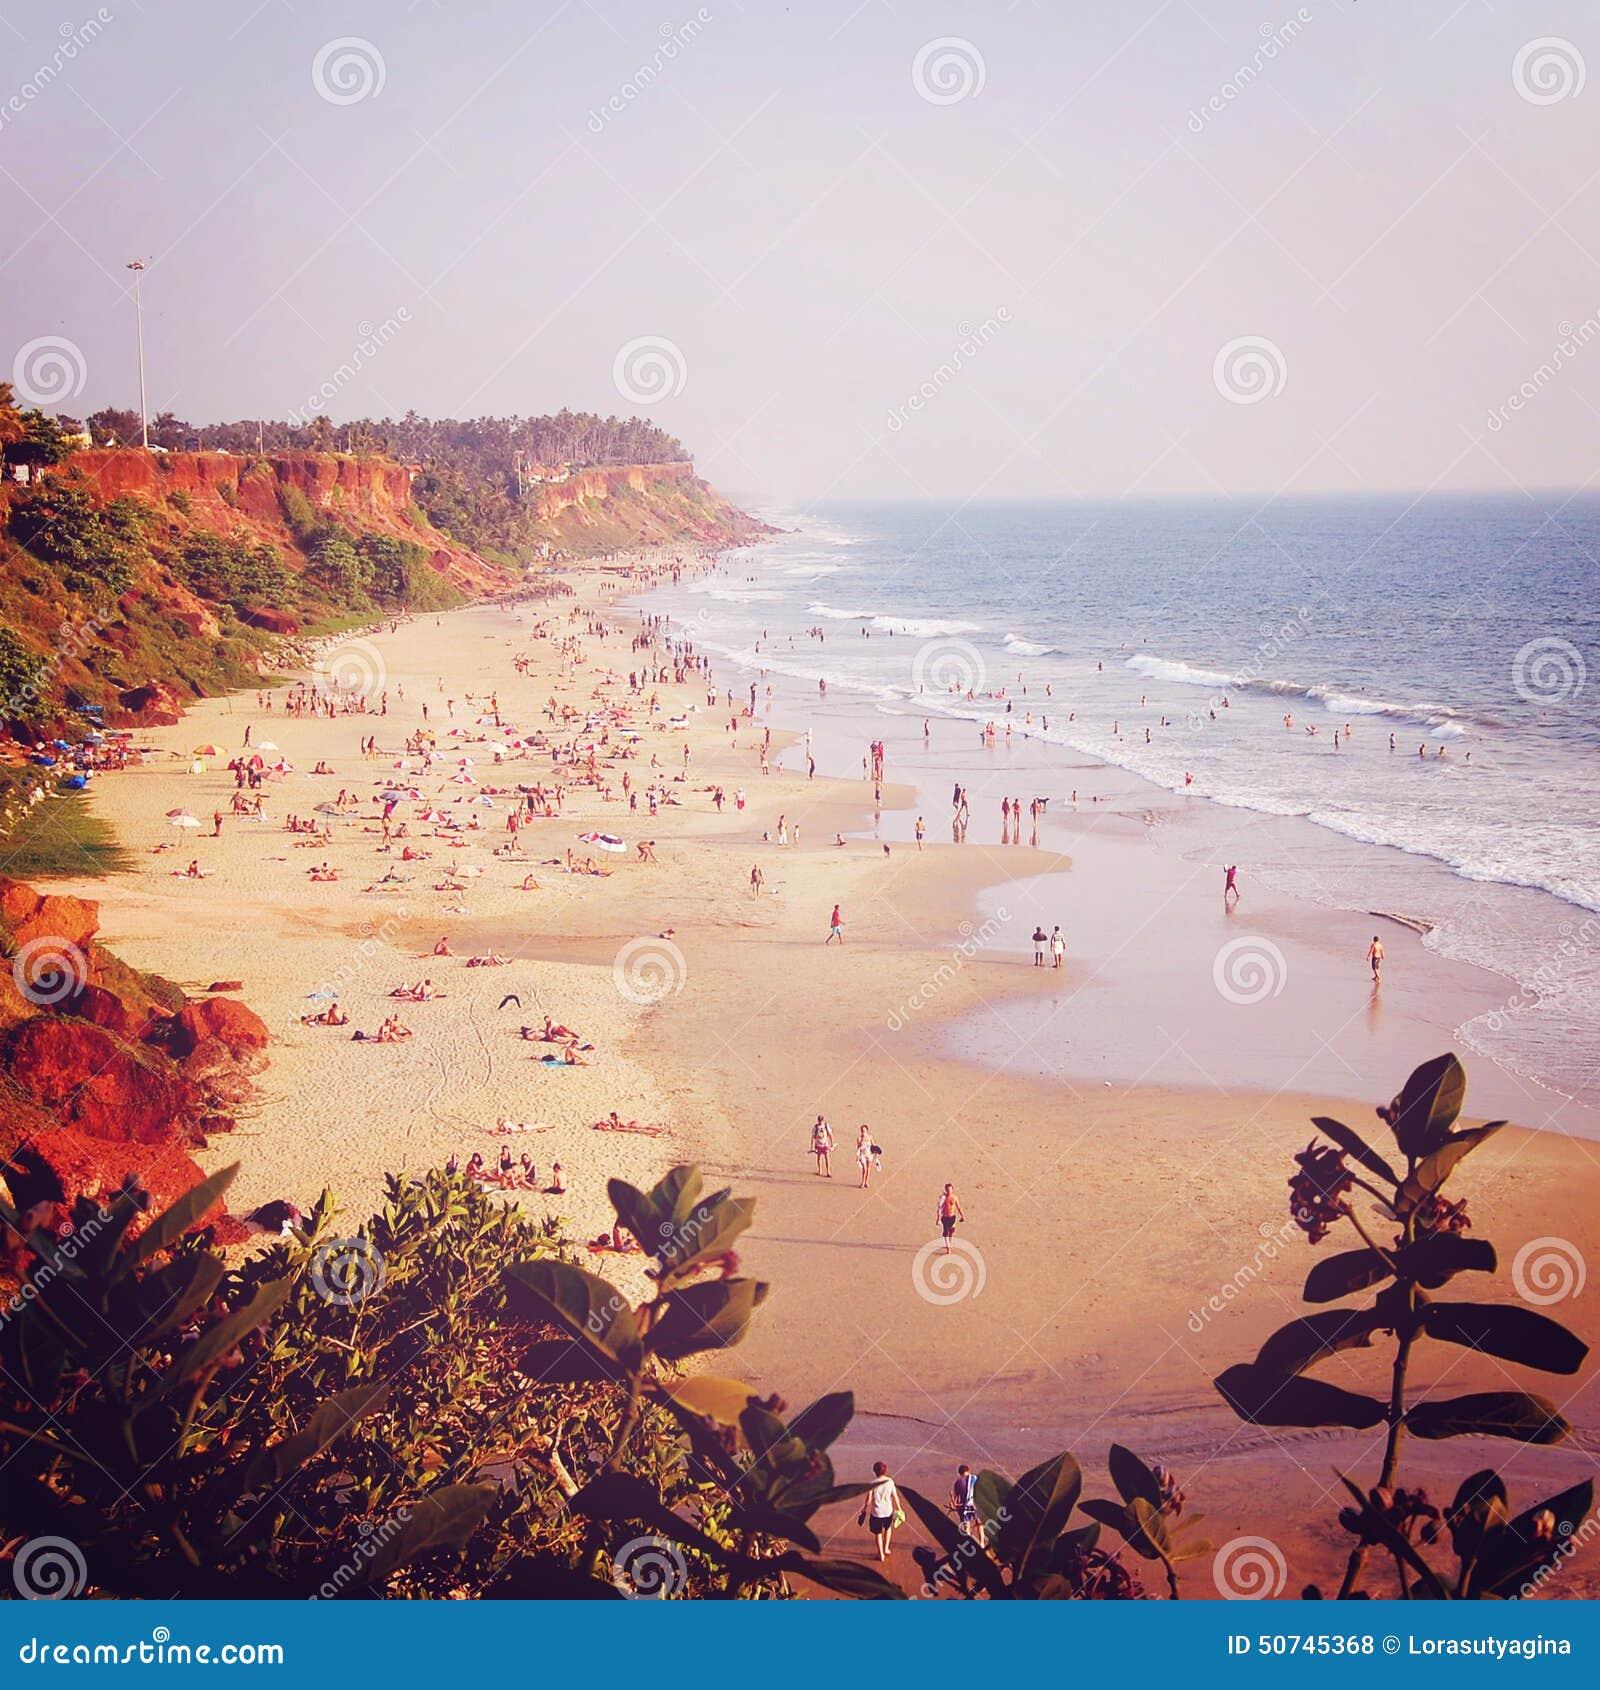 Tropical Beach And Peaceful Ocean